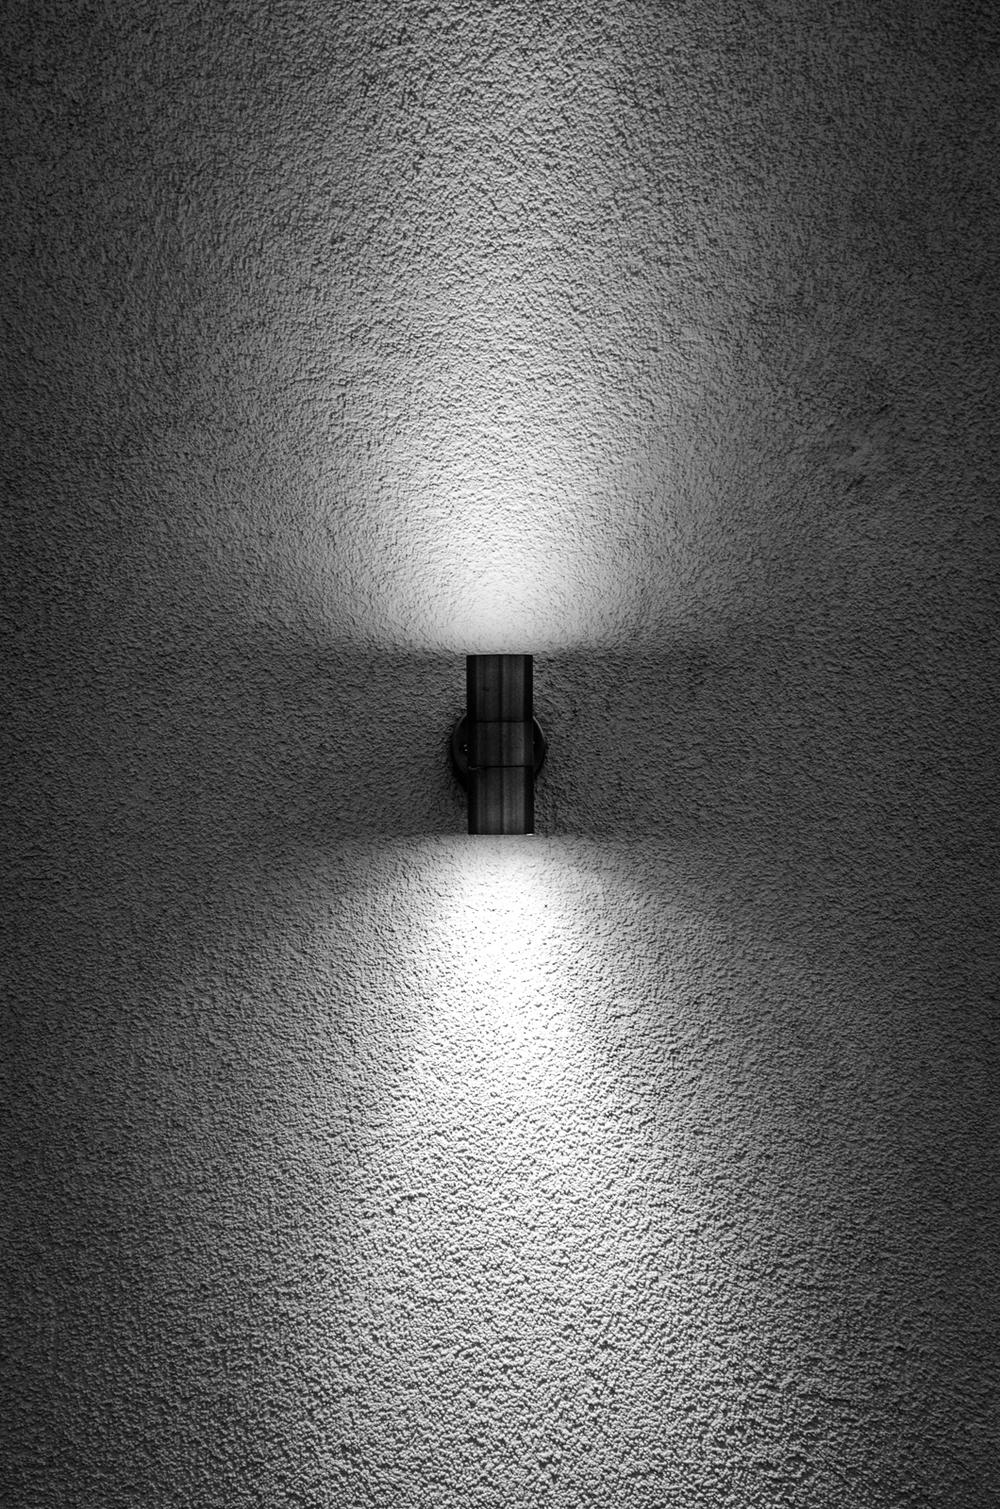 Project 365: #81 - Lamp